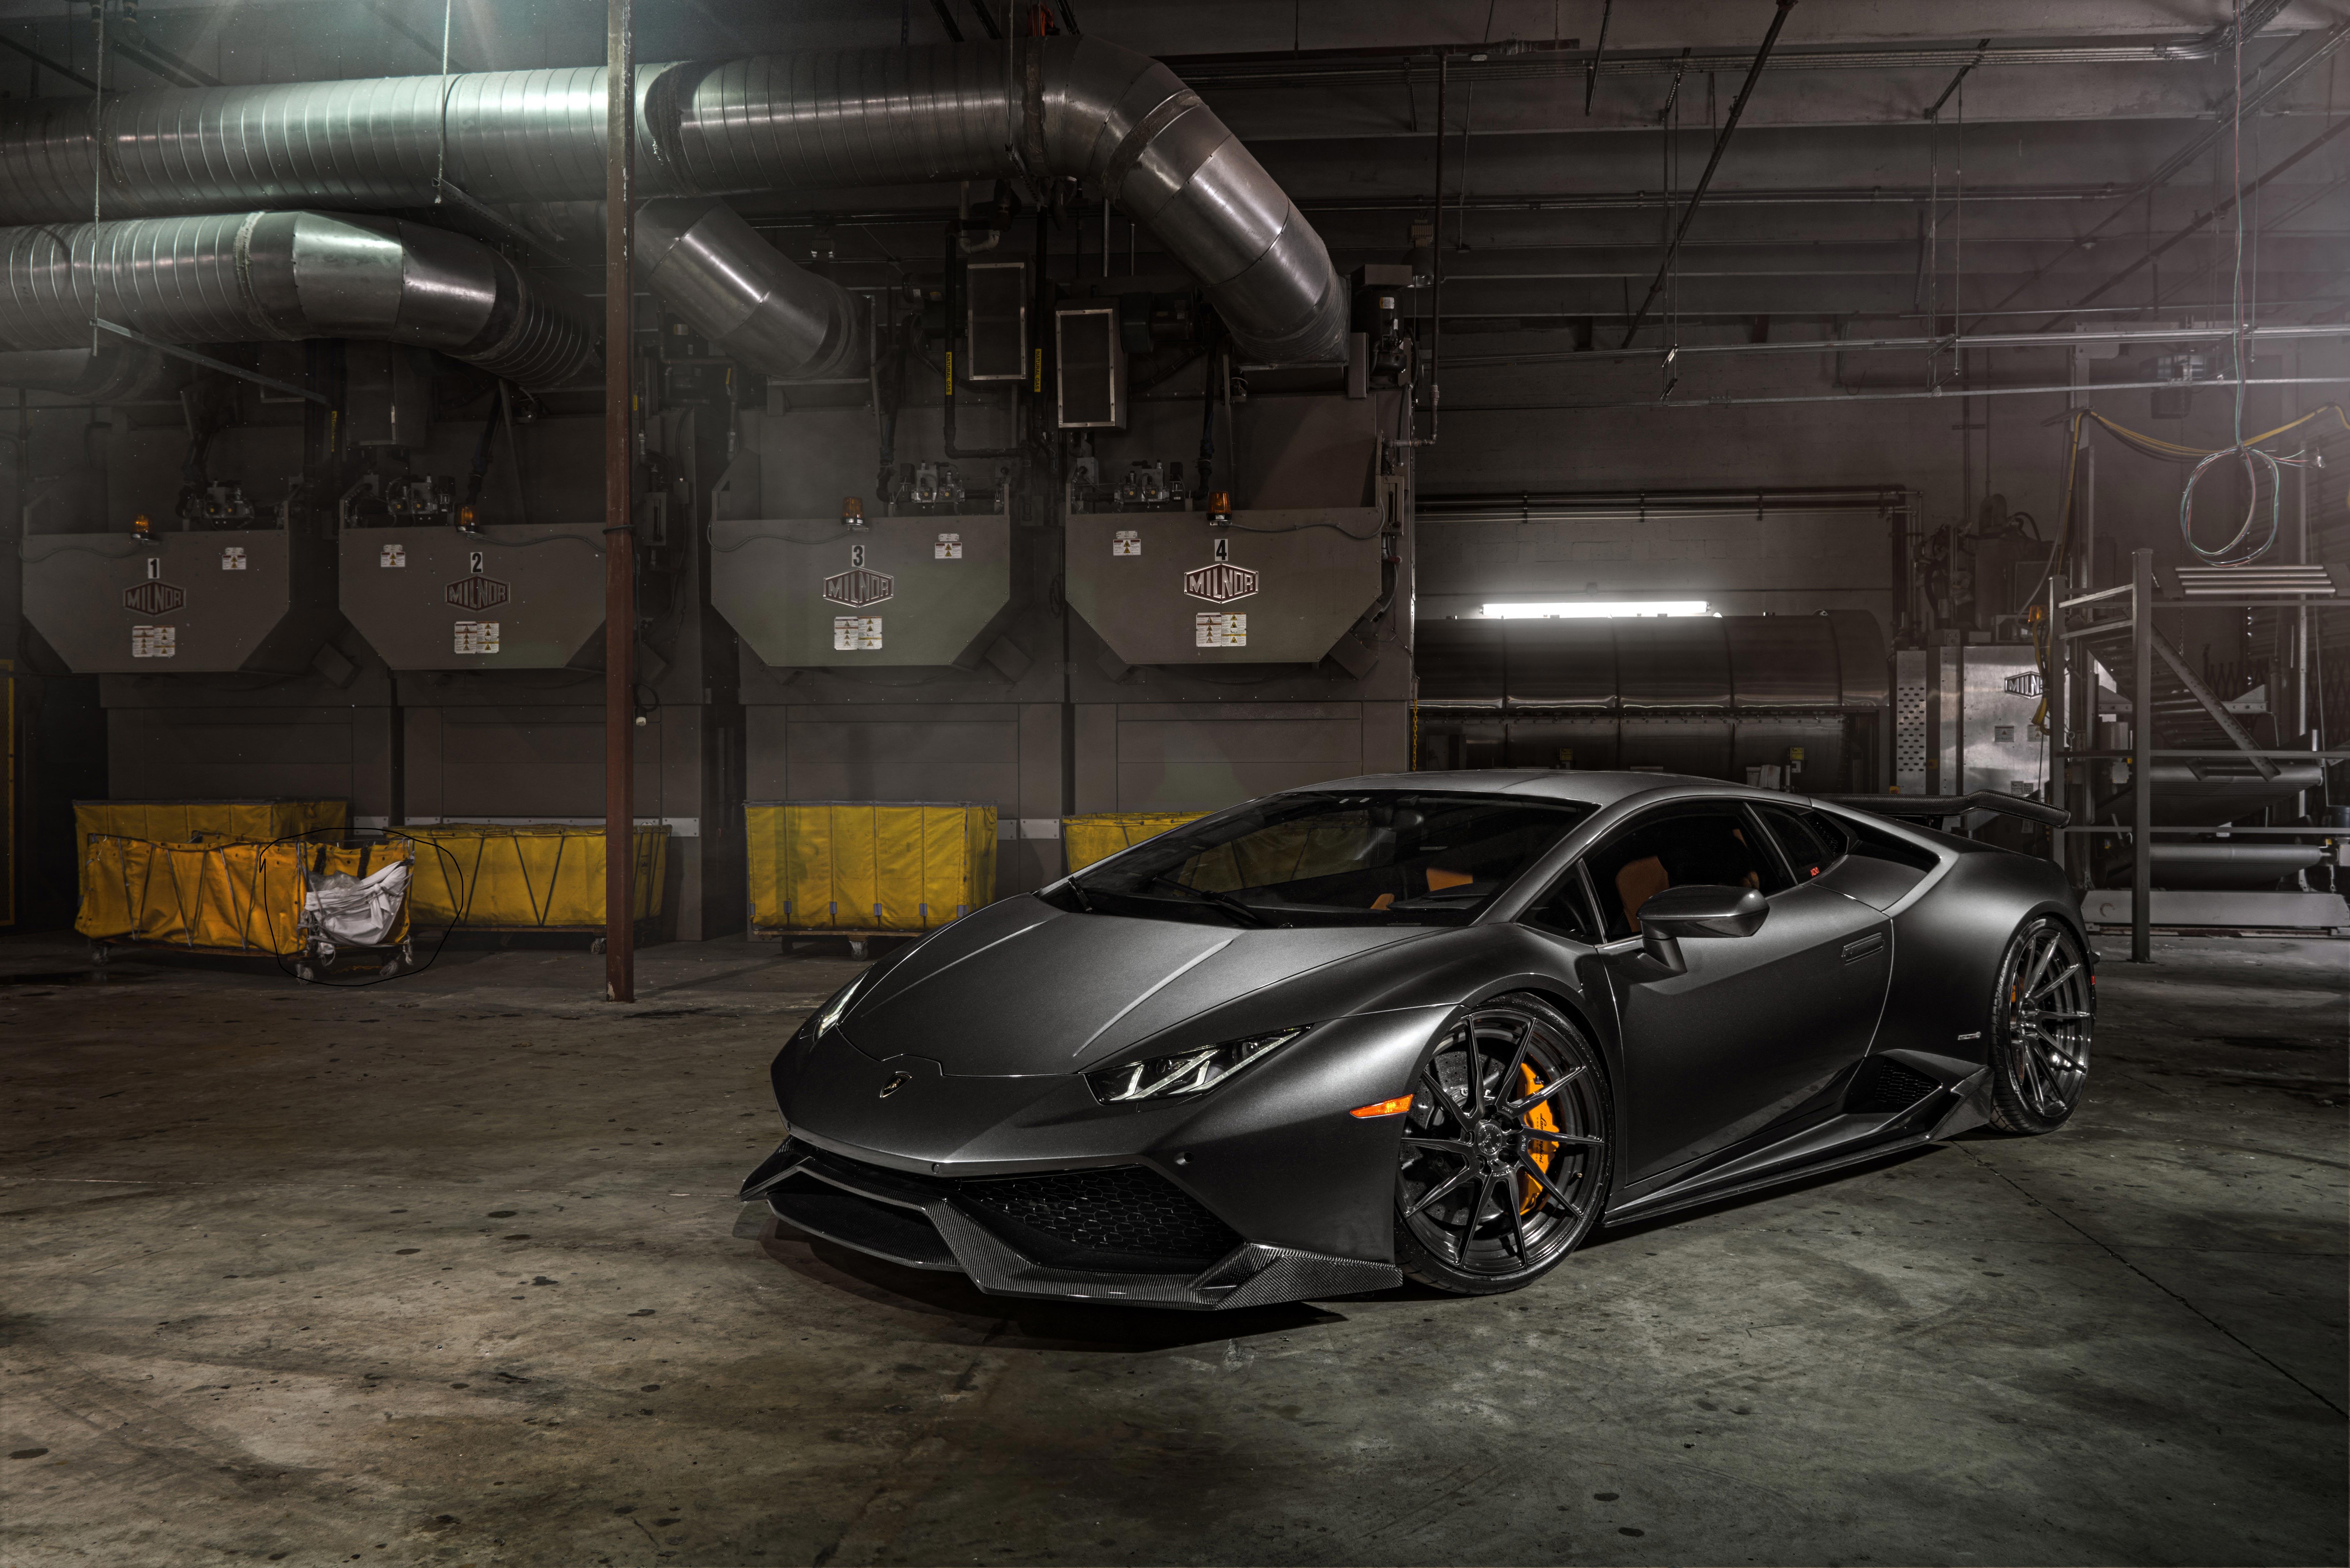 Lamborghini Huracan 8k Hd Cars 4k Wallpapers Images Backgrounds